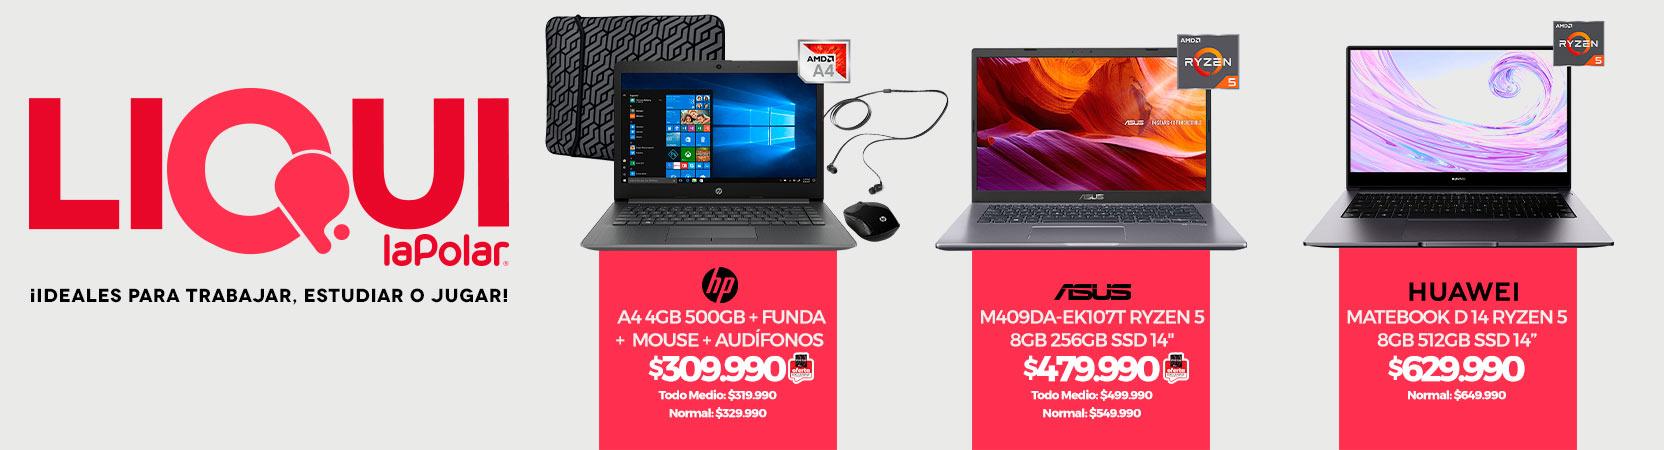 ¡Ideales para trabajar, estudiar o jugar!   Notebook HP 14-CM0029 A4 4GB 500GB 14 + Funda + Mouse inalámbrico + Audífonos